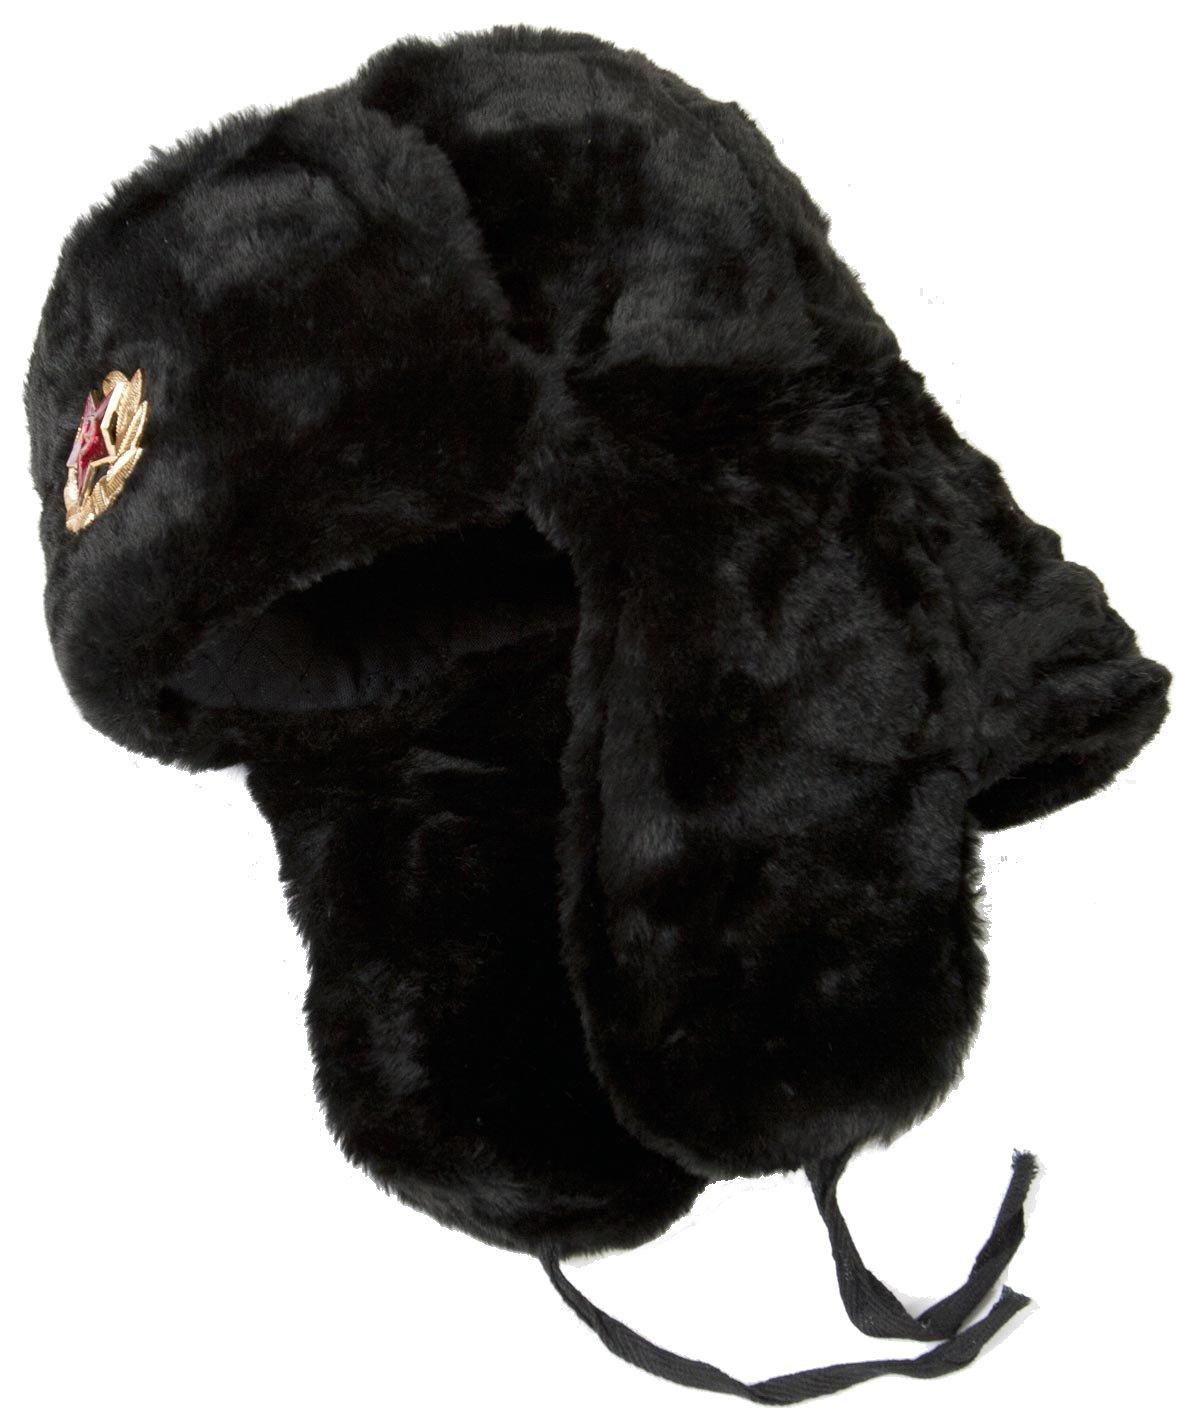 Russian Soviet Army Fur Military Cossack Ushanka Hat (Black, 58/M)   B009BQUI2O